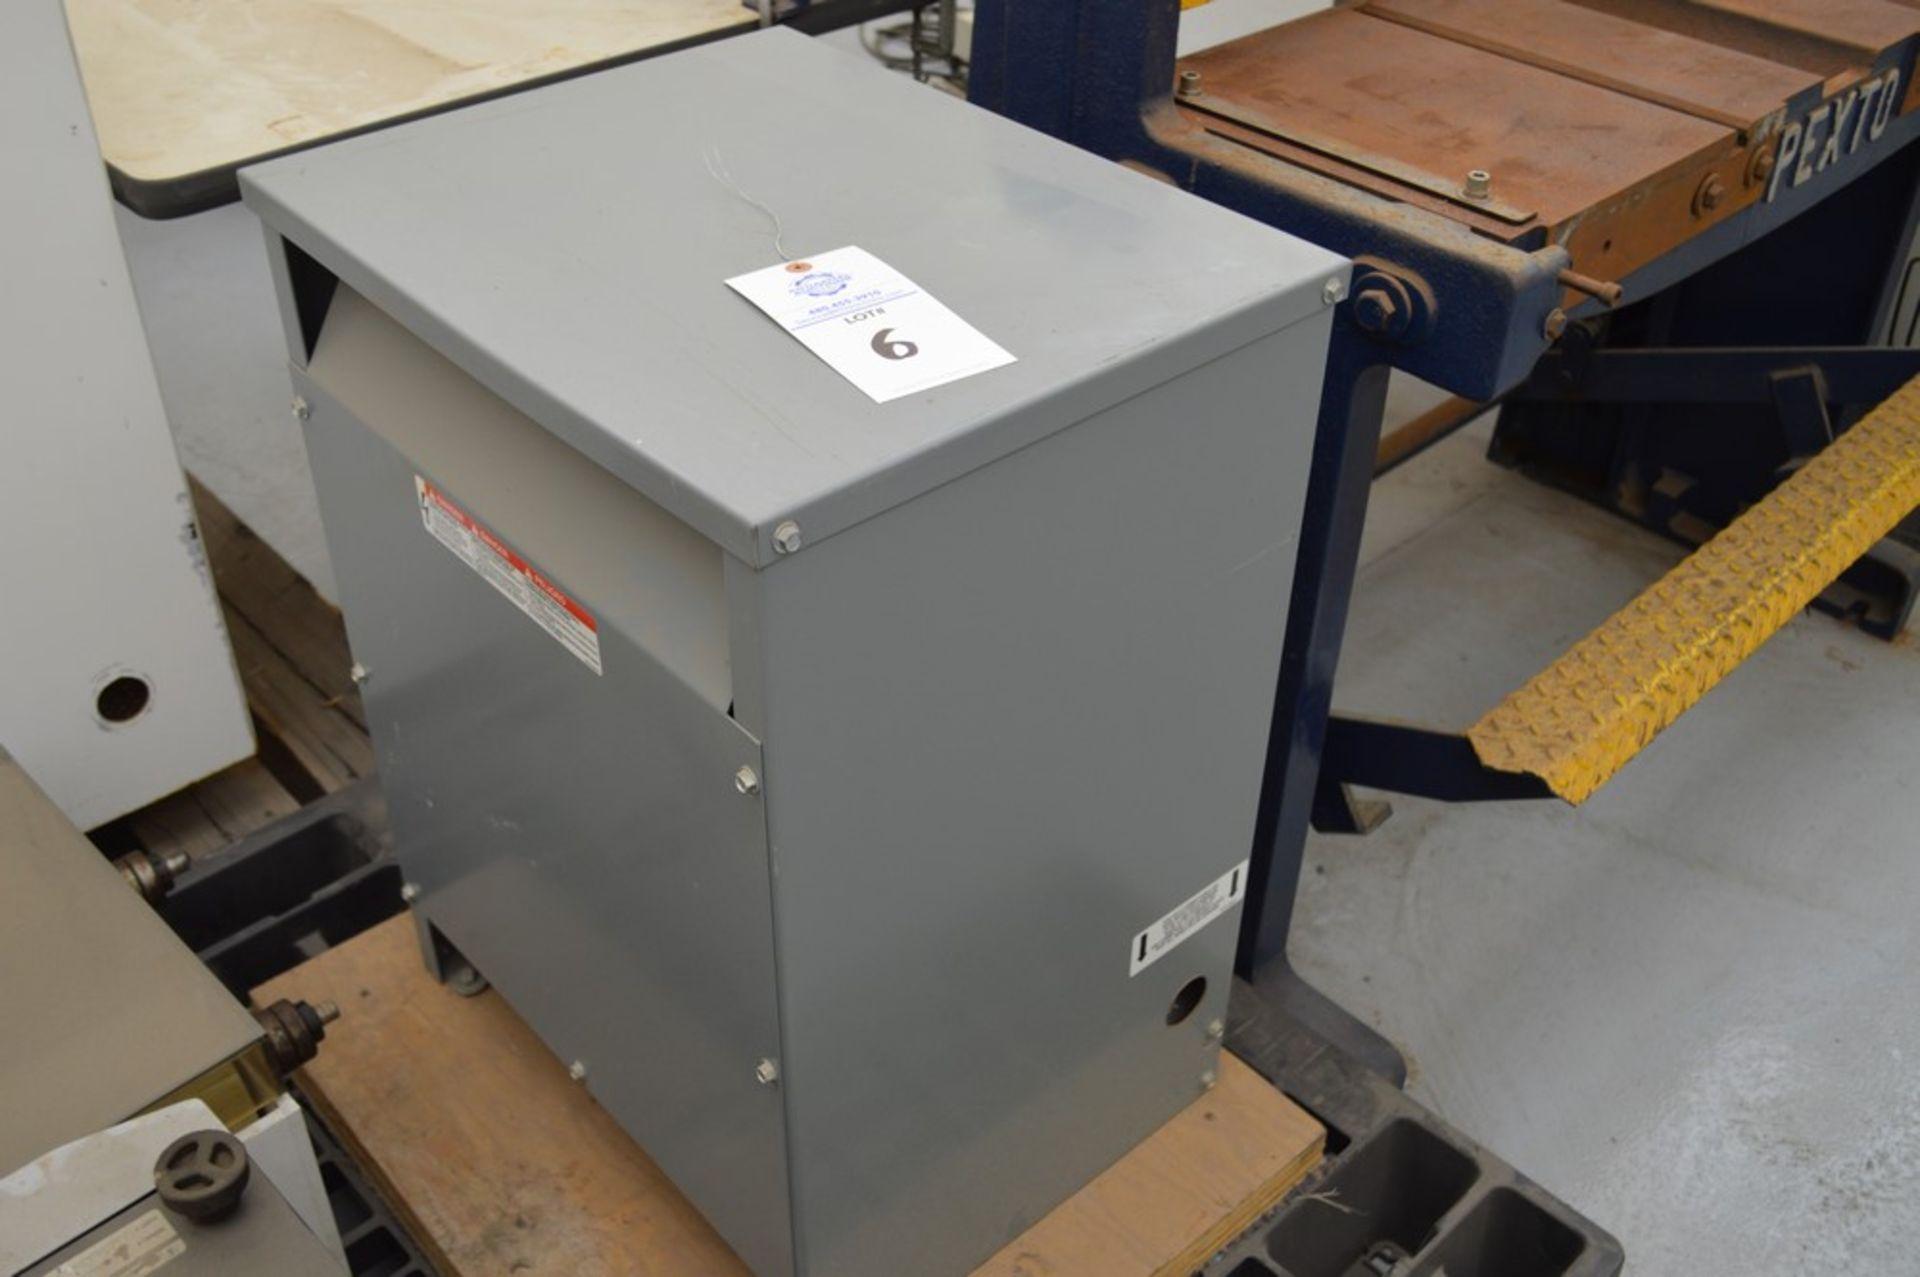 Grey Transformer 30 KVA 3 PhaseSquare D Company, 480V 36 Amp 208 V 83 Amp mounted on wood